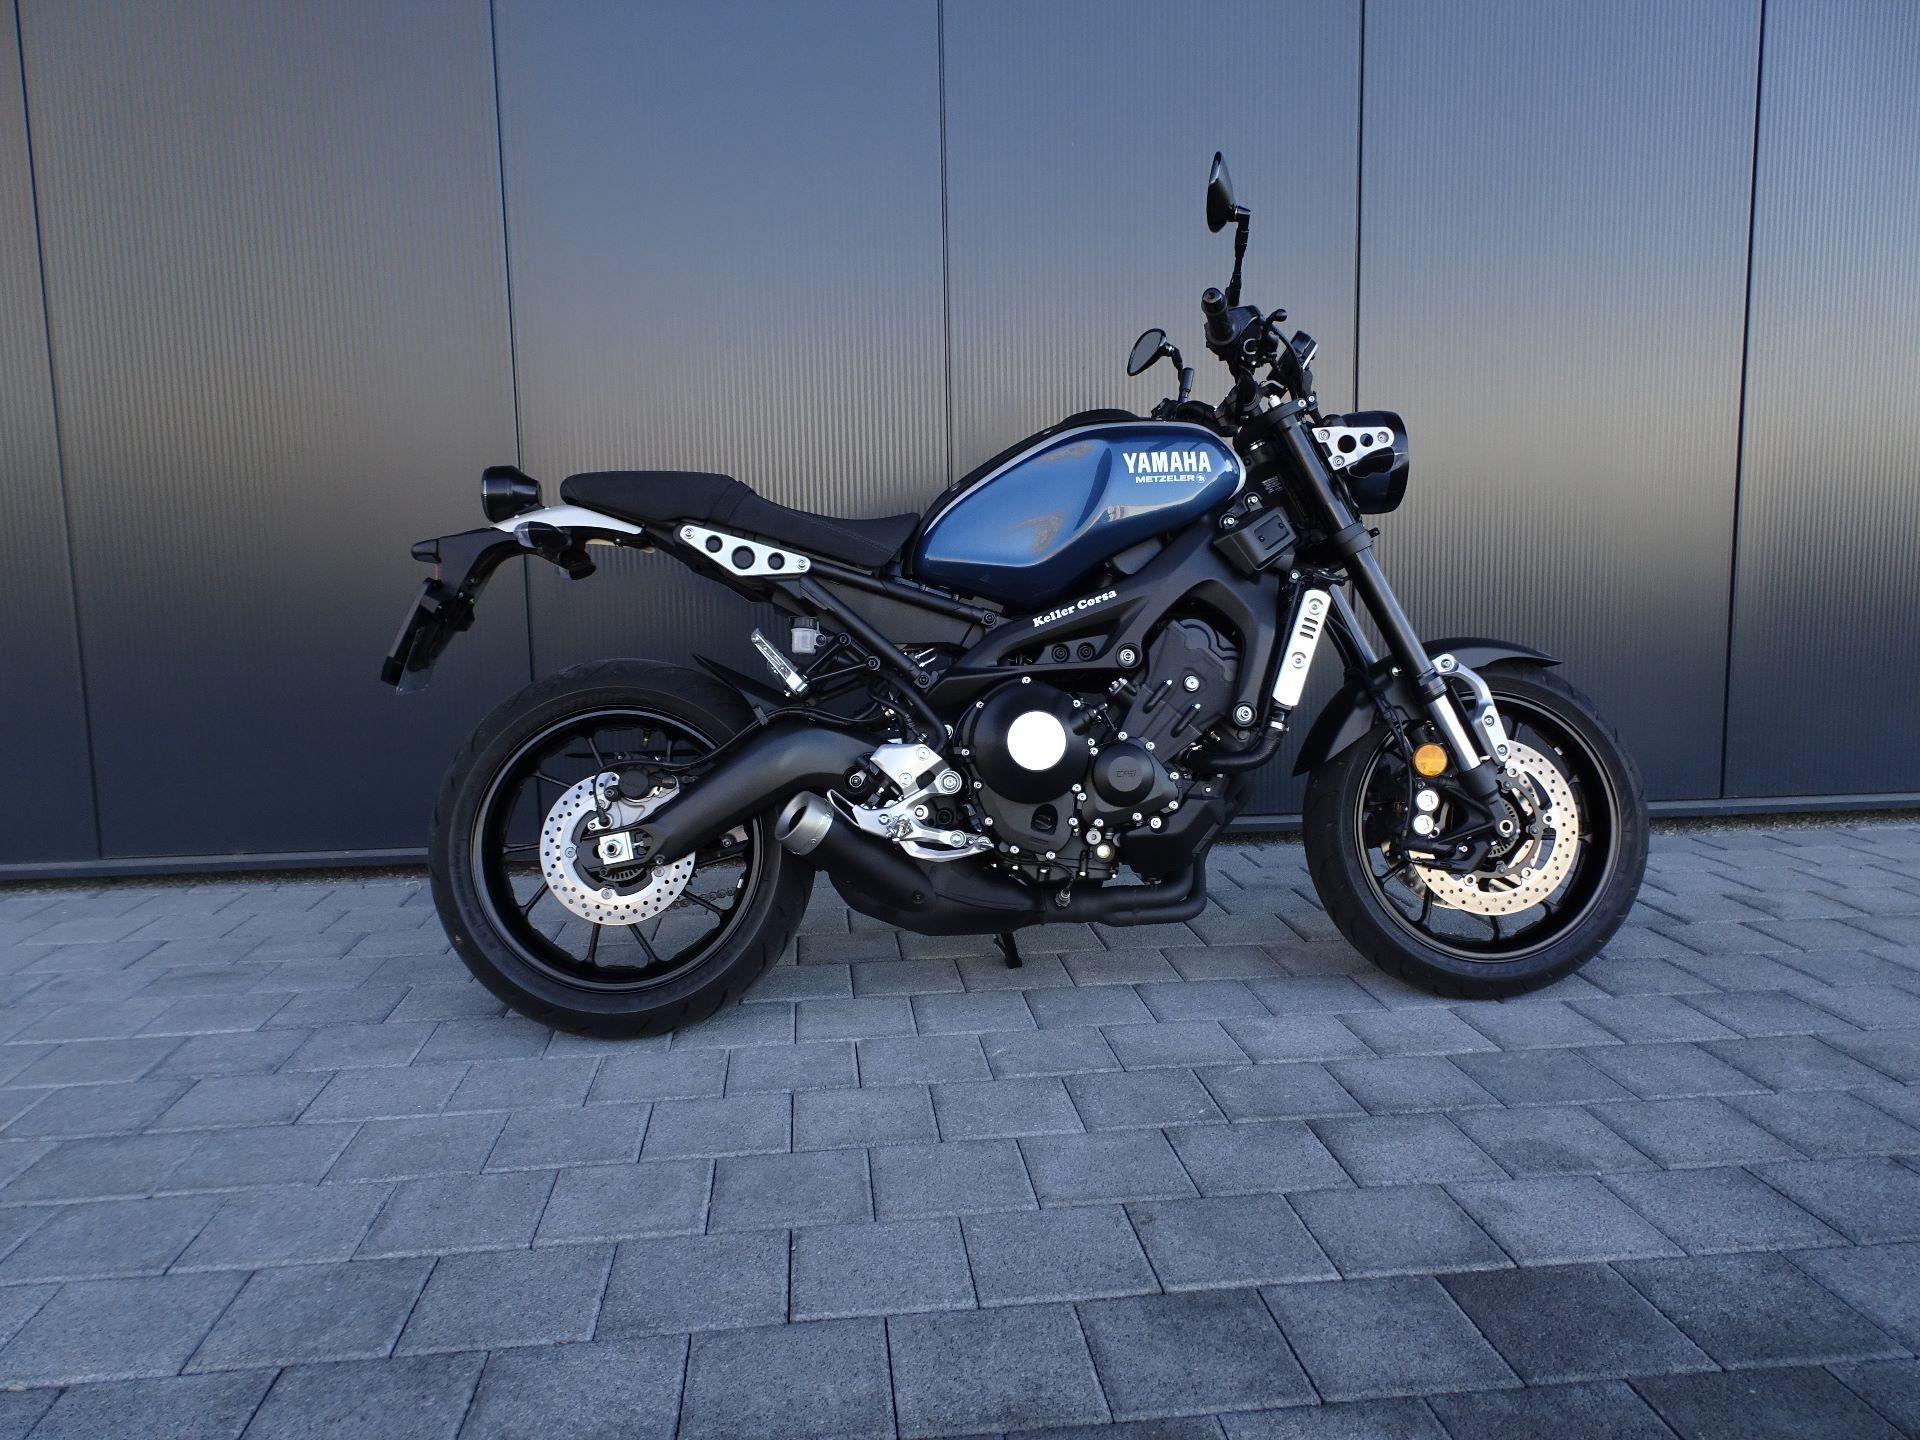 motorrad occasion kaufen yamaha xsr 900 abs keller motos. Black Bedroom Furniture Sets. Home Design Ideas